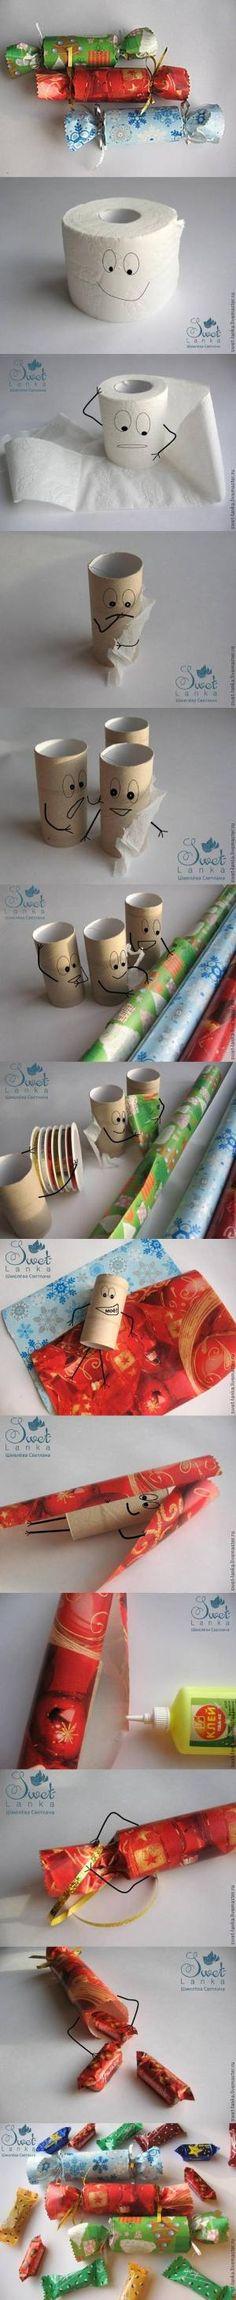 Shoebox Crafts : DIY Toilet Paper Roll Santa Claus Candy Box